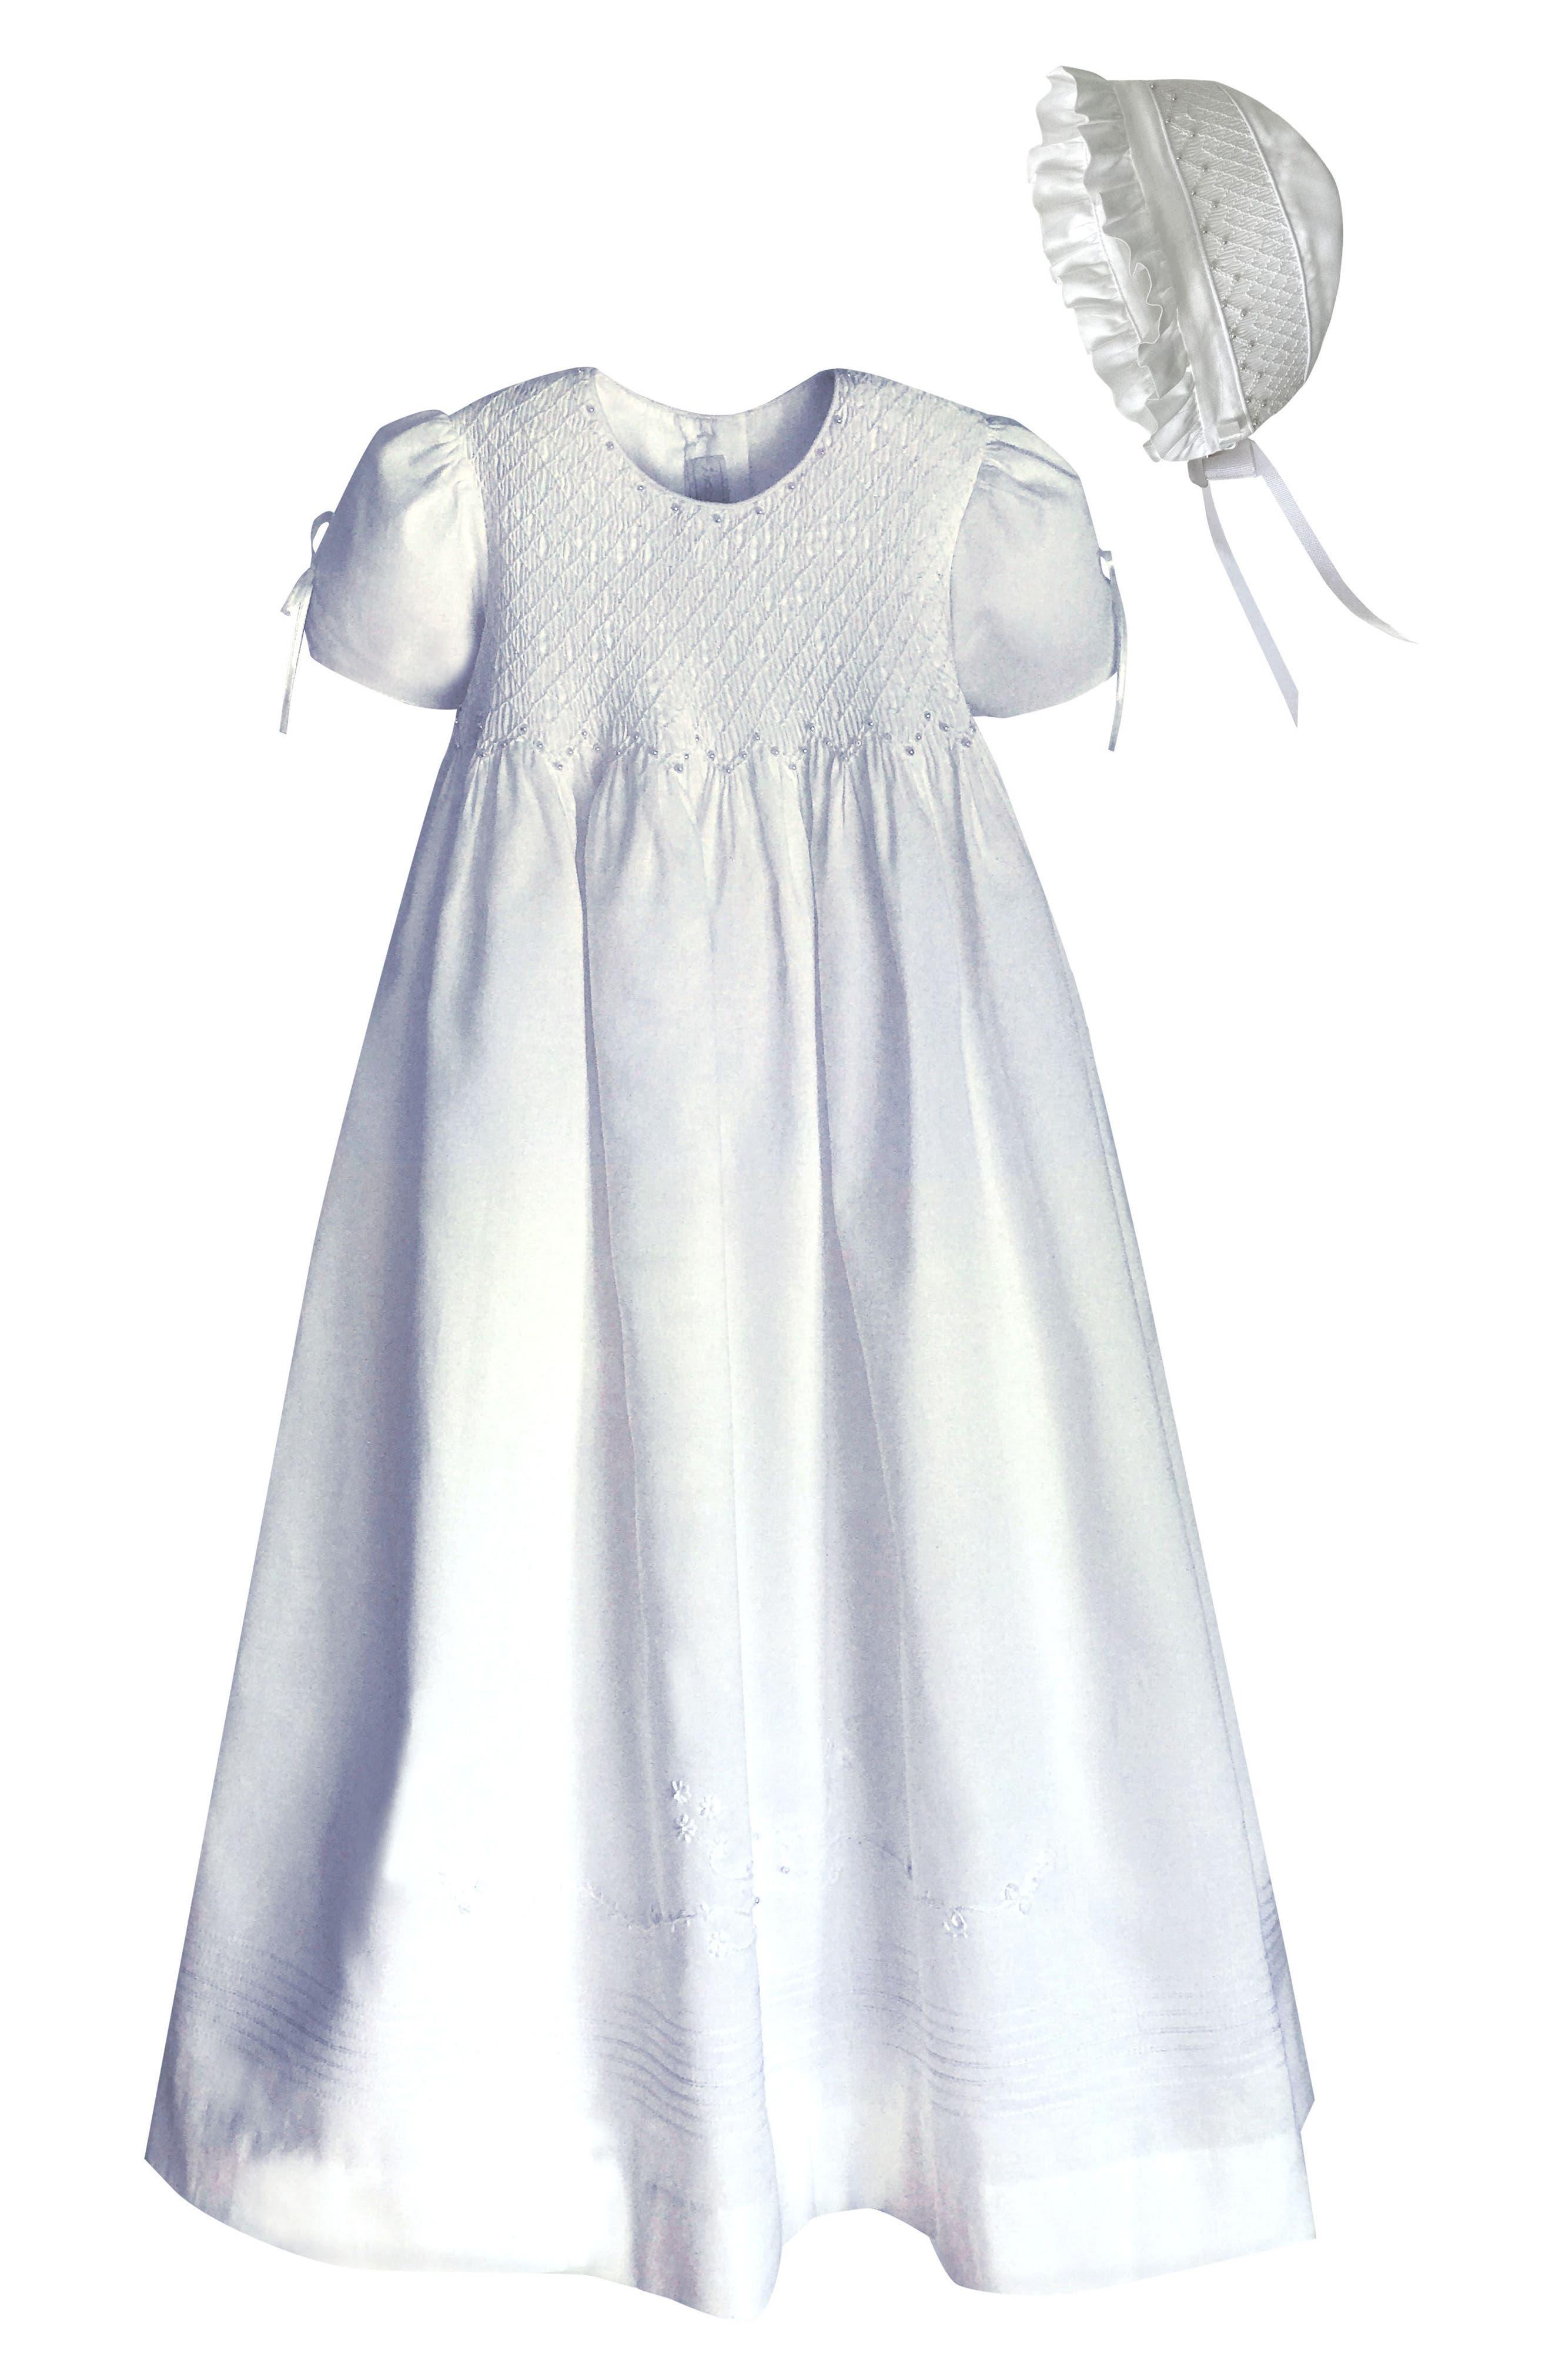 Main Image - Isabel Garreton 'Pearls' Christening Gown & Bonnet (Baby)